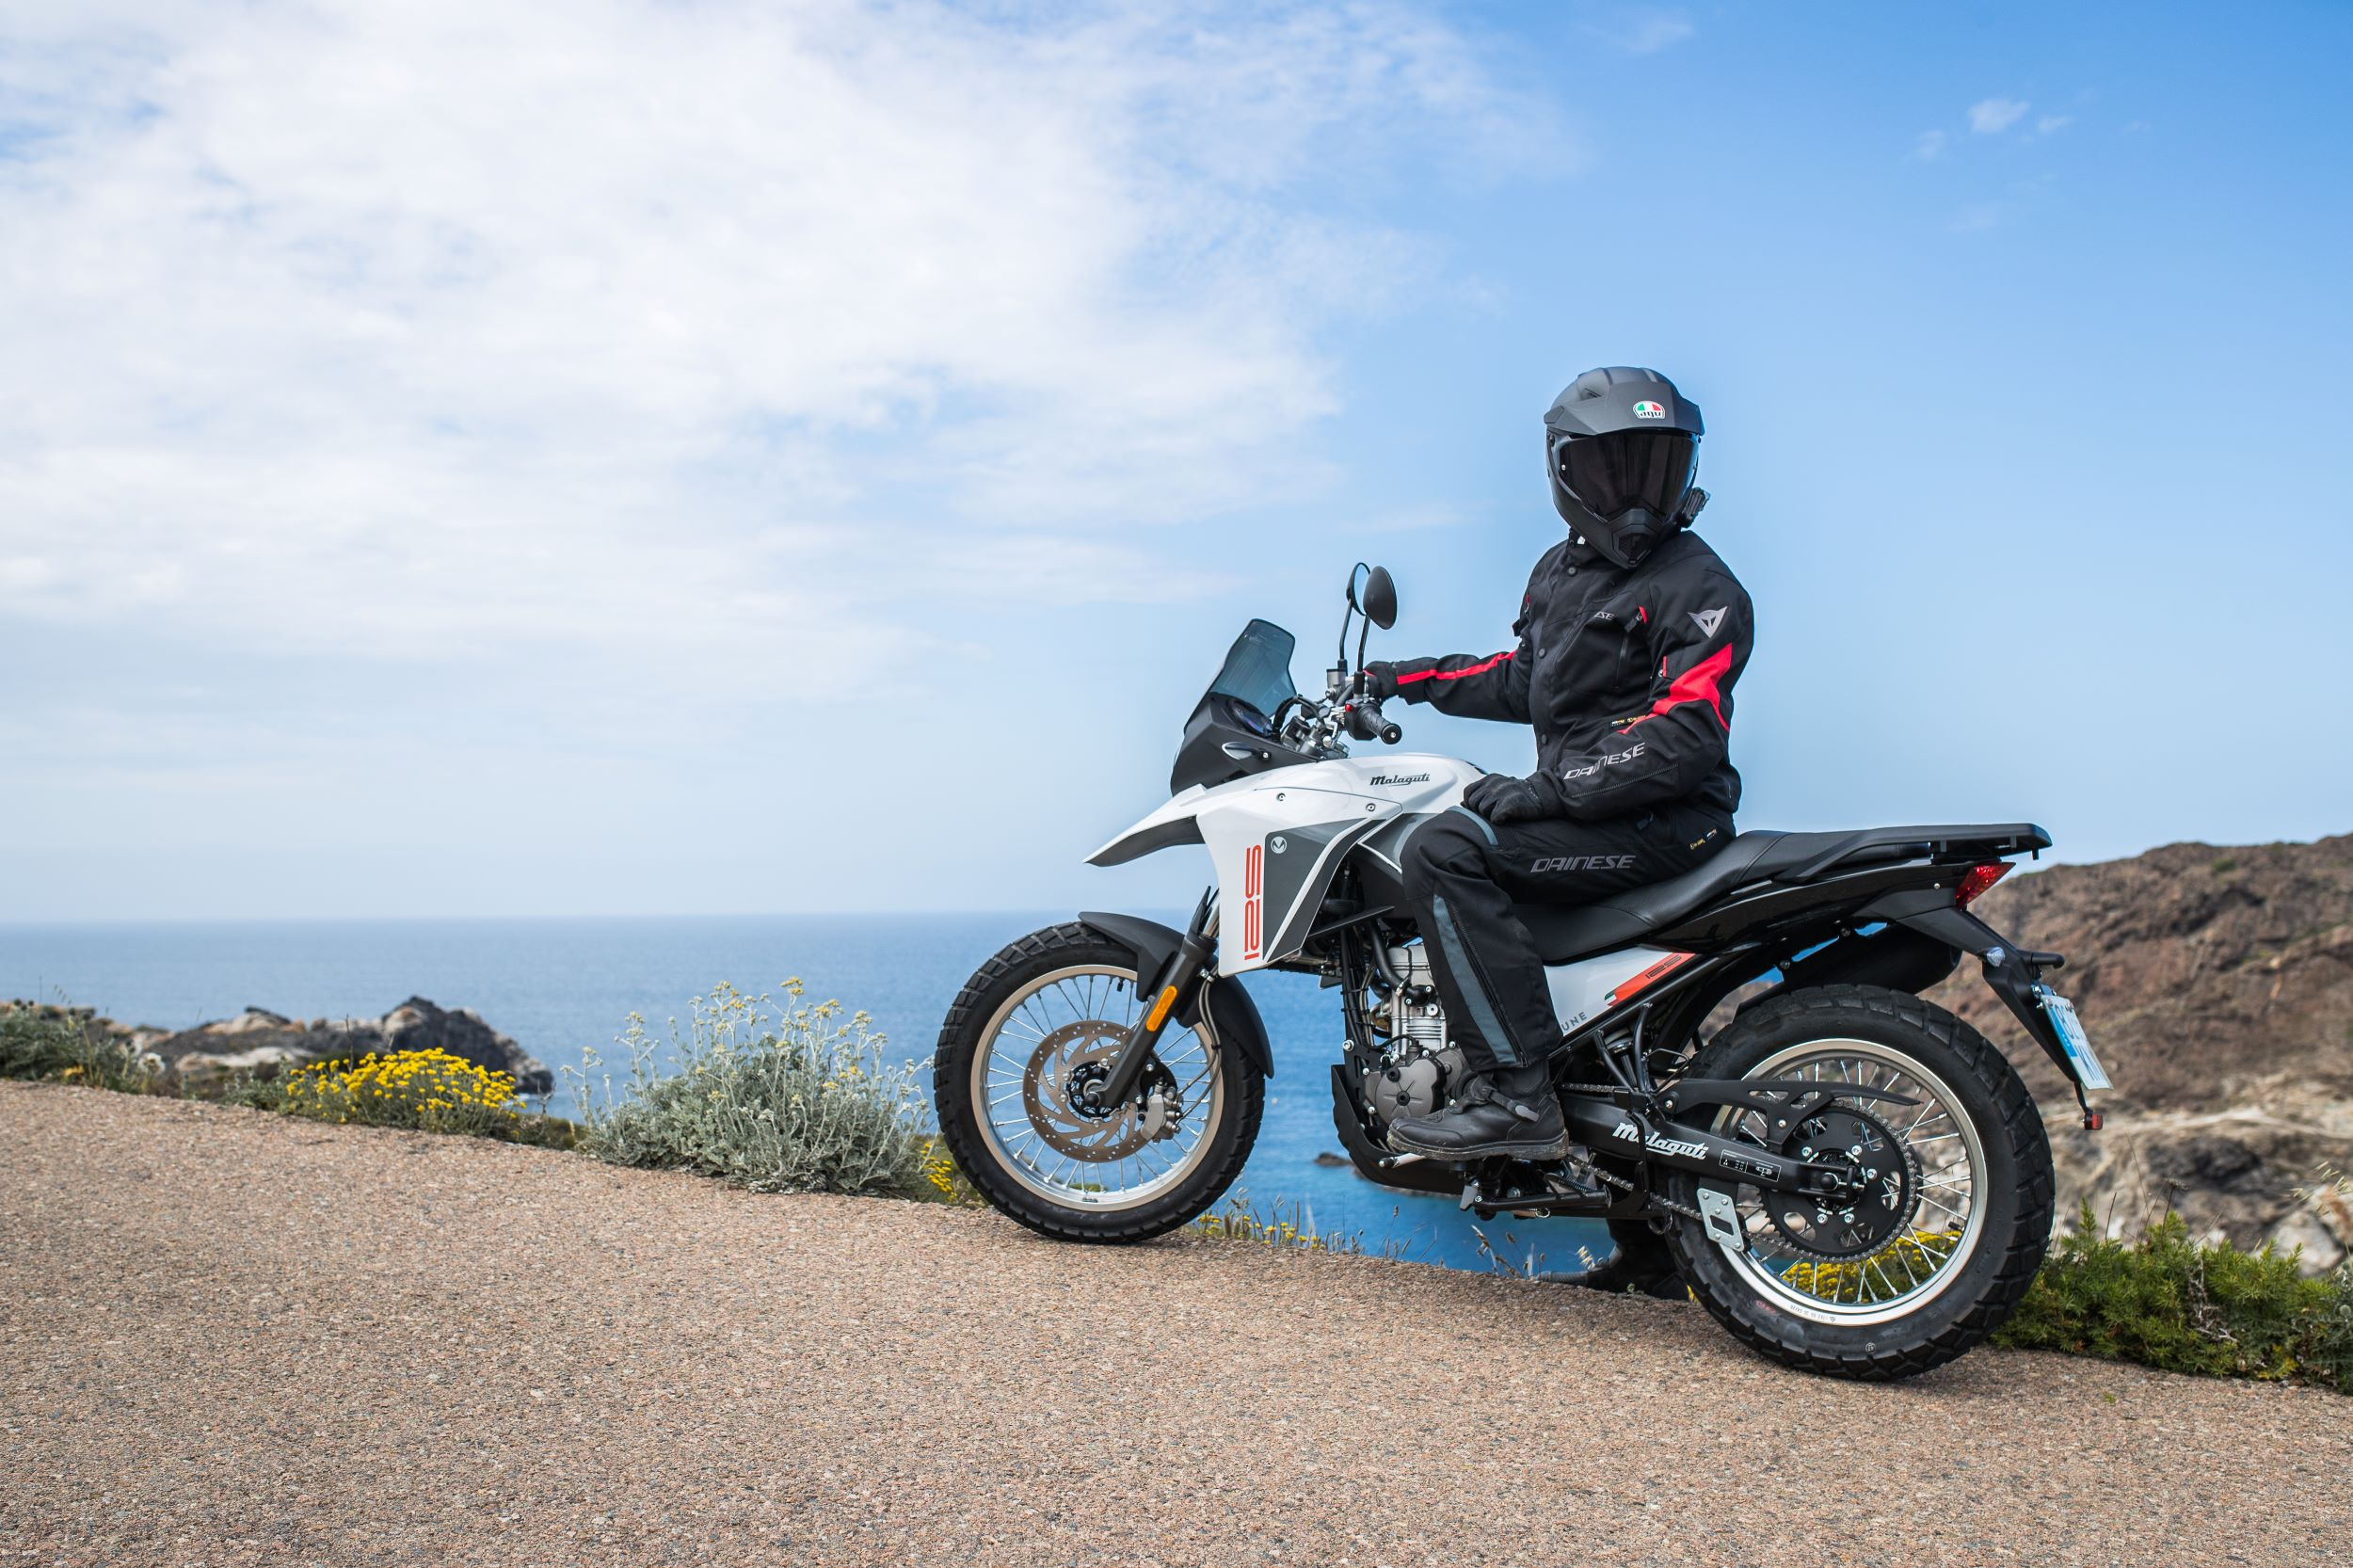 https://malaguti.bike/wp-content/uploads/sites/3/2021/08/dune-.jpg